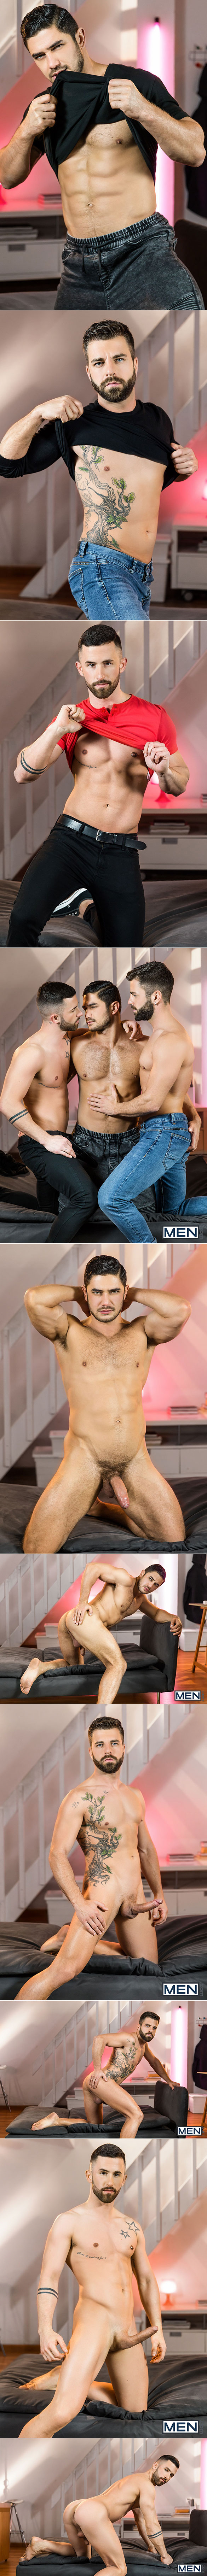 "Men.com: Dato Foland, Hector De Silva and Sunny Colucci's threesome in ""The Couple That Fucks Together, Part 2"""